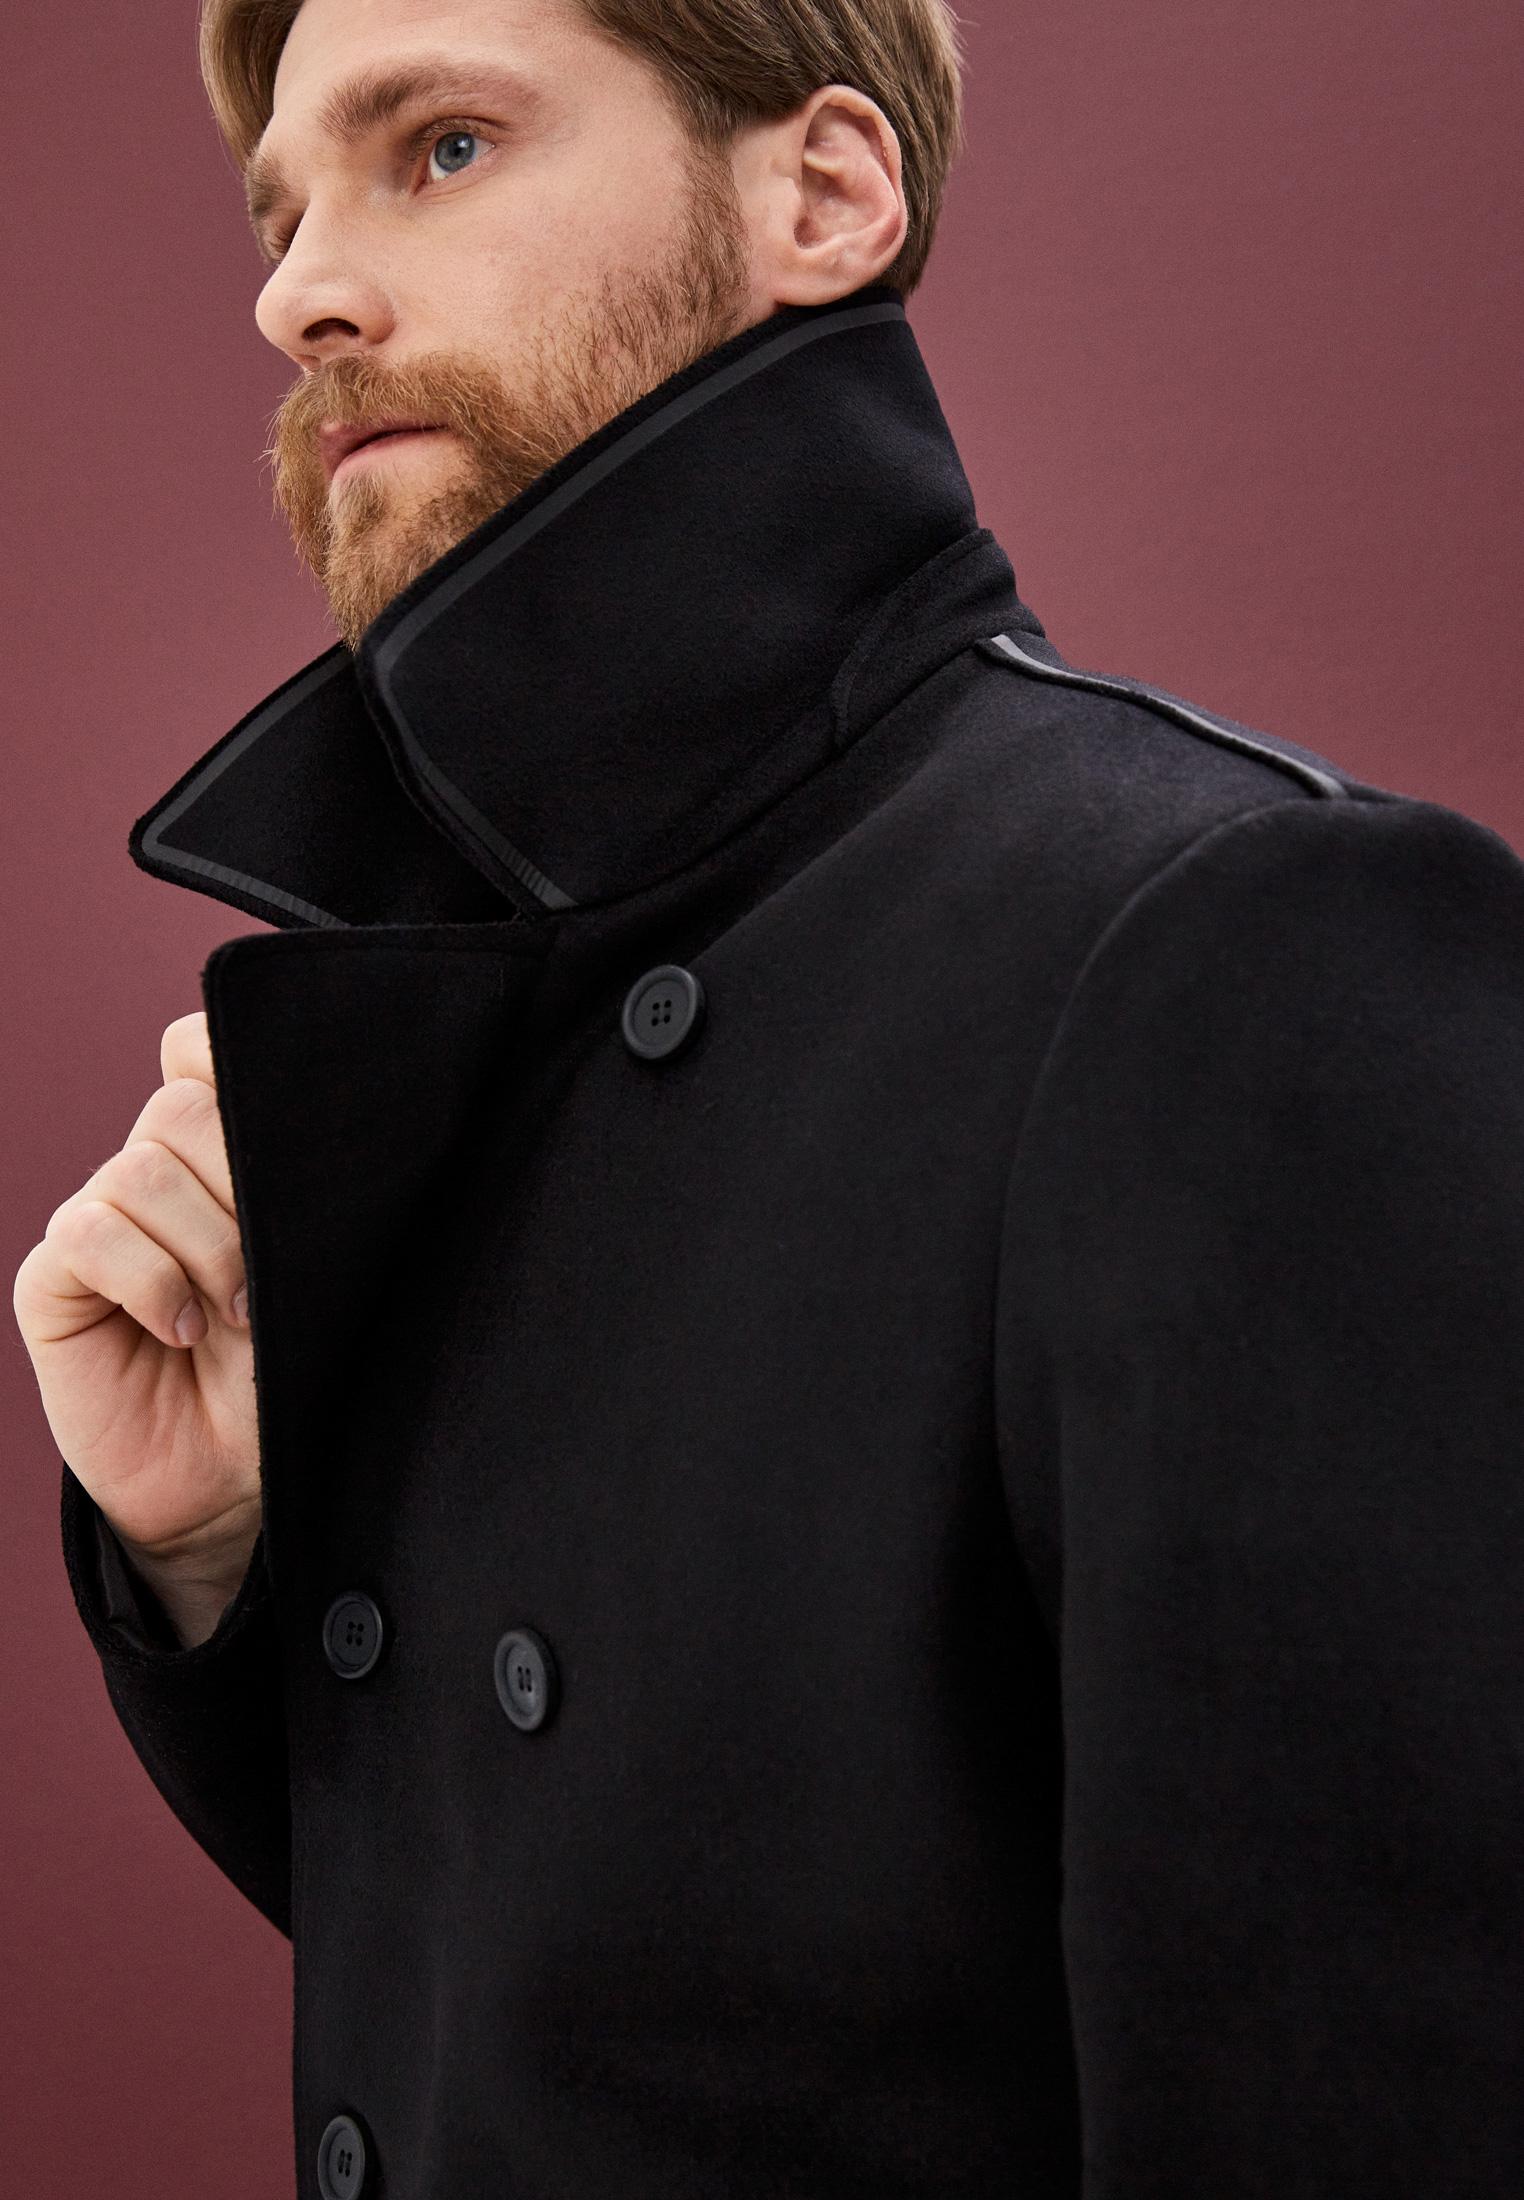 Мужское пальто Bikkembergs (Биккембергс) C J 005 01 T 9220: изображение 2